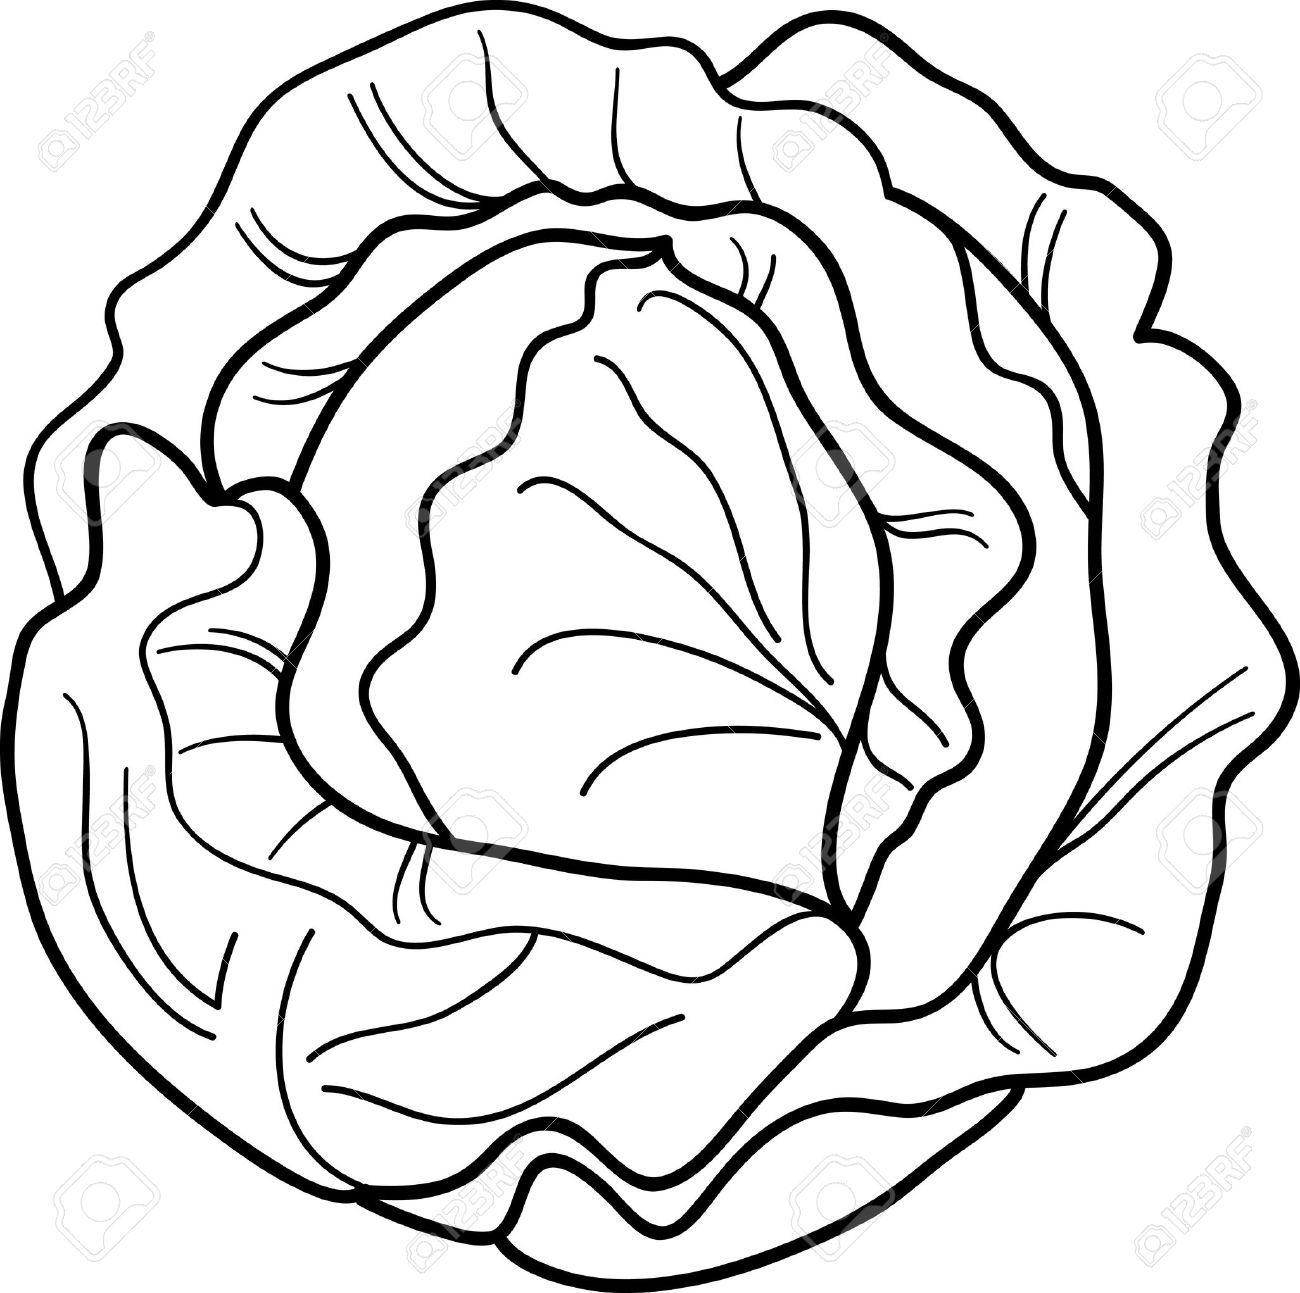 Image Result For Printable Lettuce Clipart Black And White